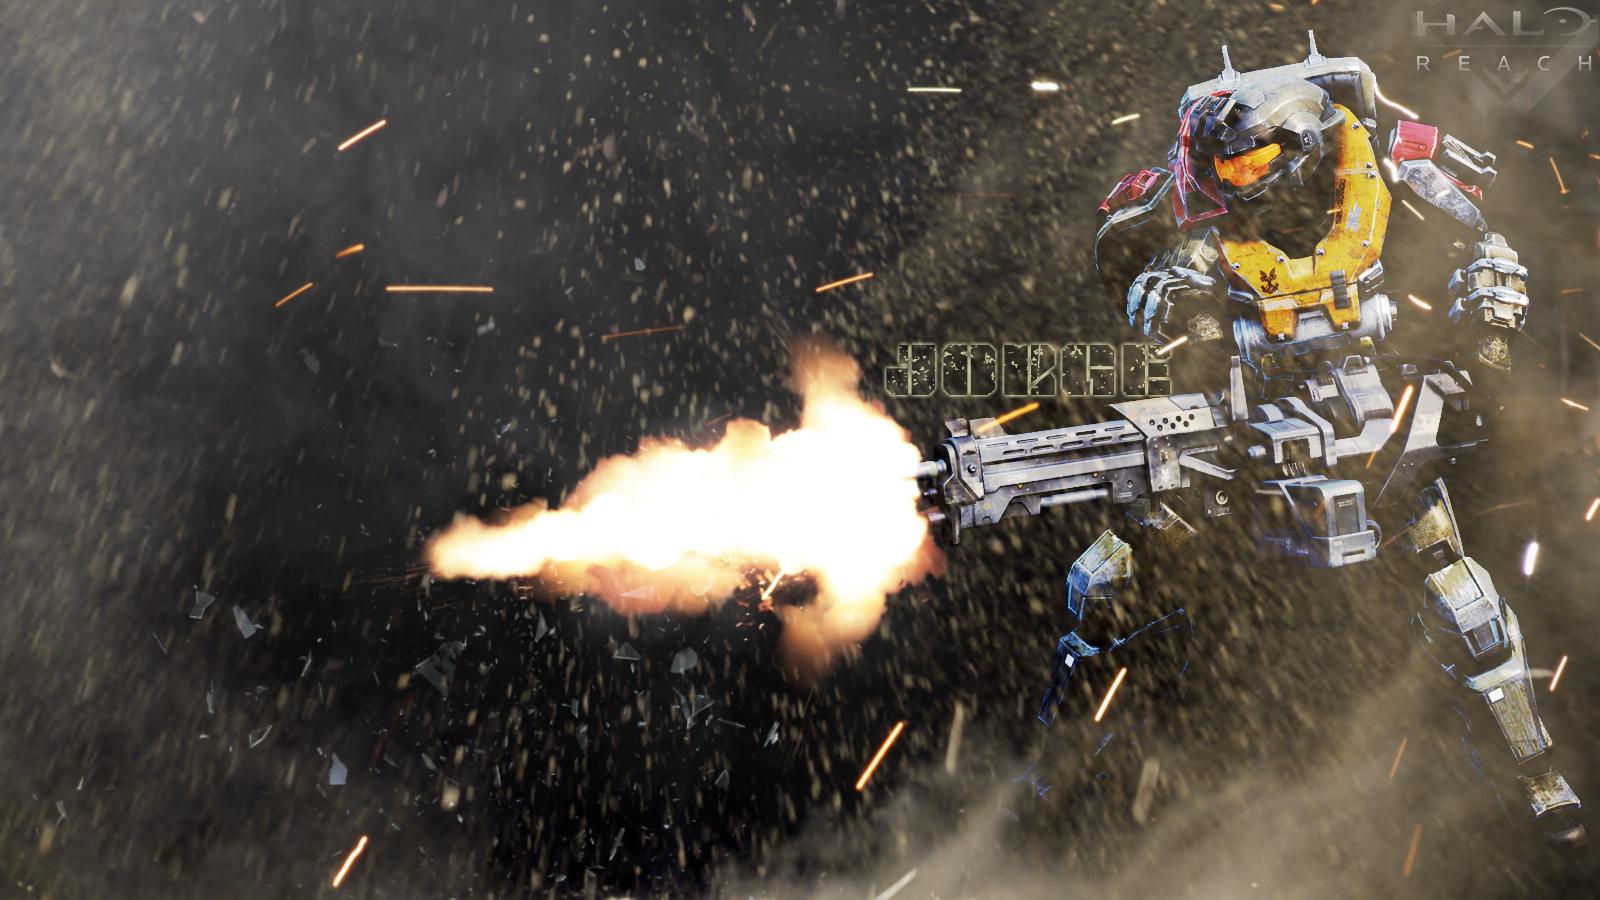 halo reach jorge wallpaper by vito adp fan art wallpaper games 2010 1600x900